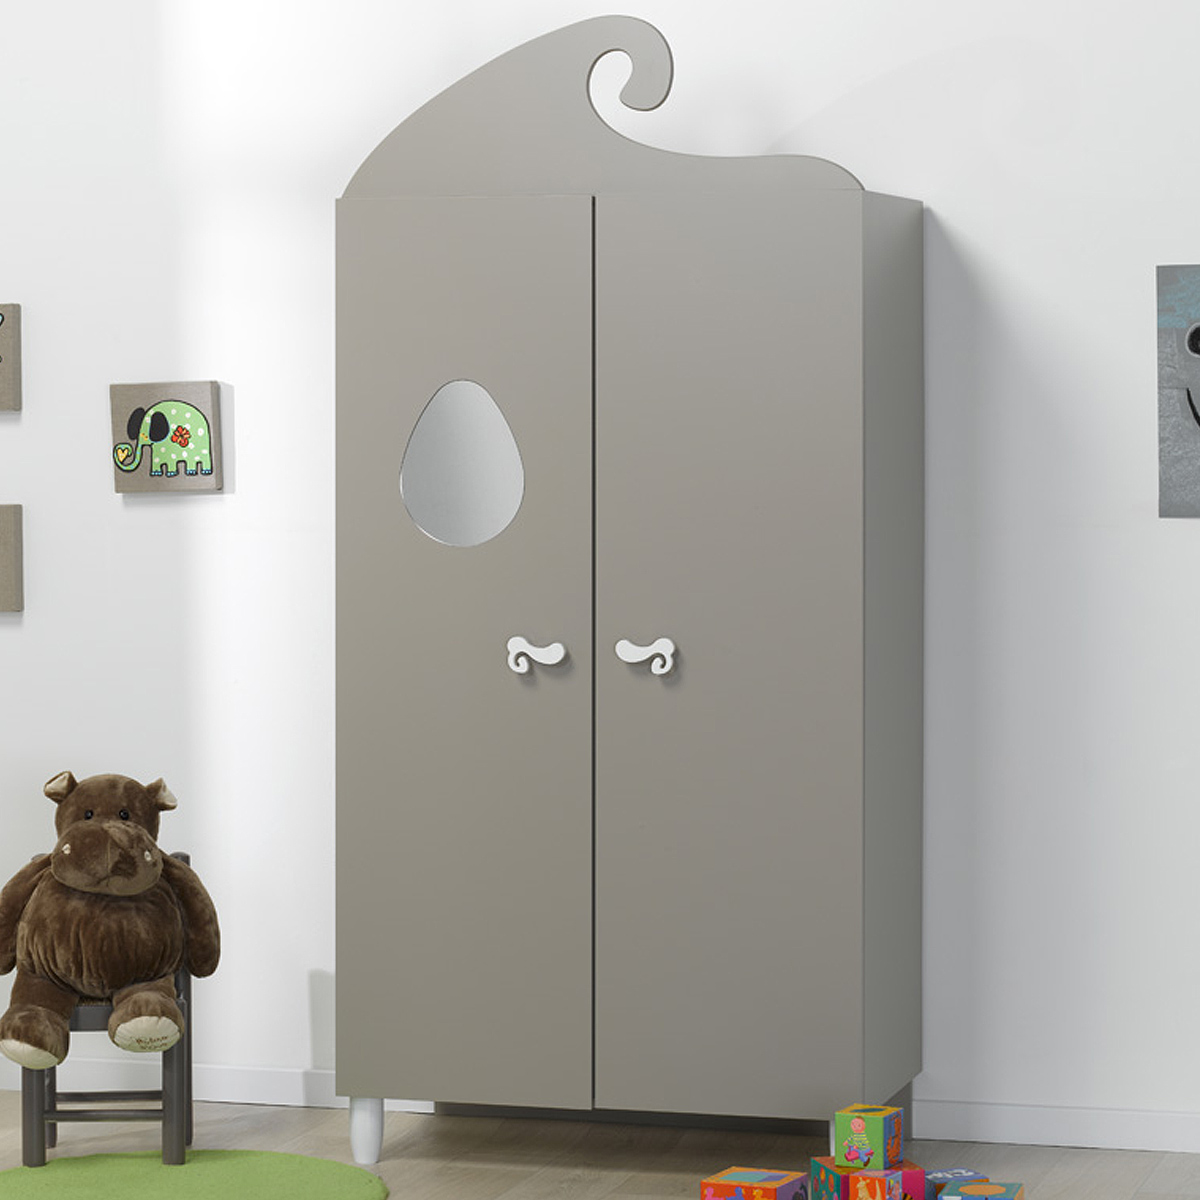 loupiot_lutin_lin_armoire_fermée